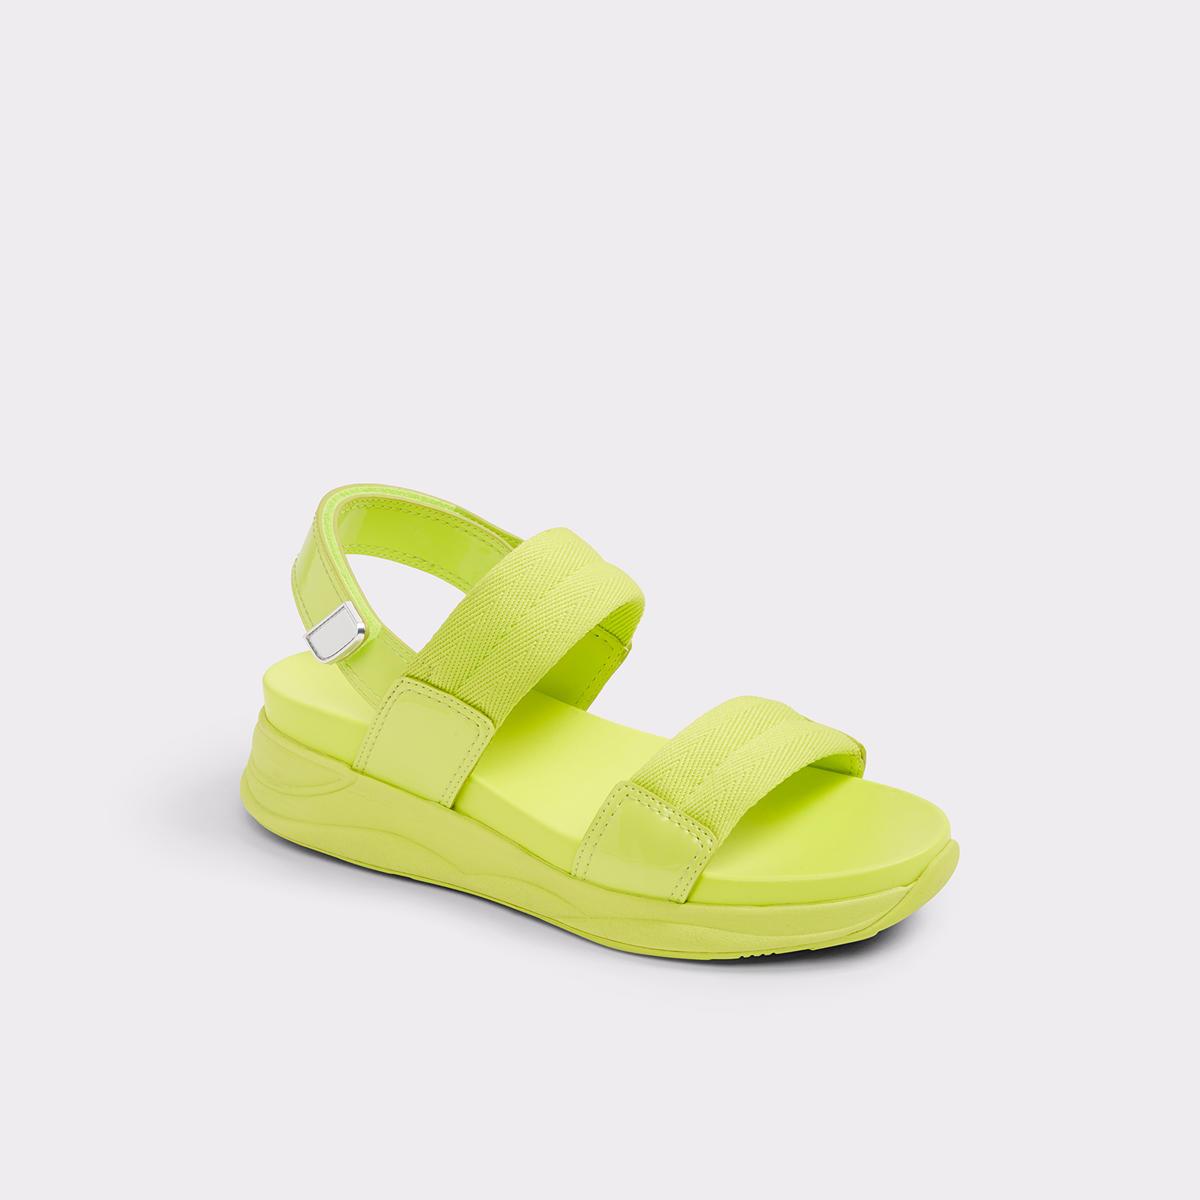 f3912ecb17b4 Eloima Light Yellow Women s Flats